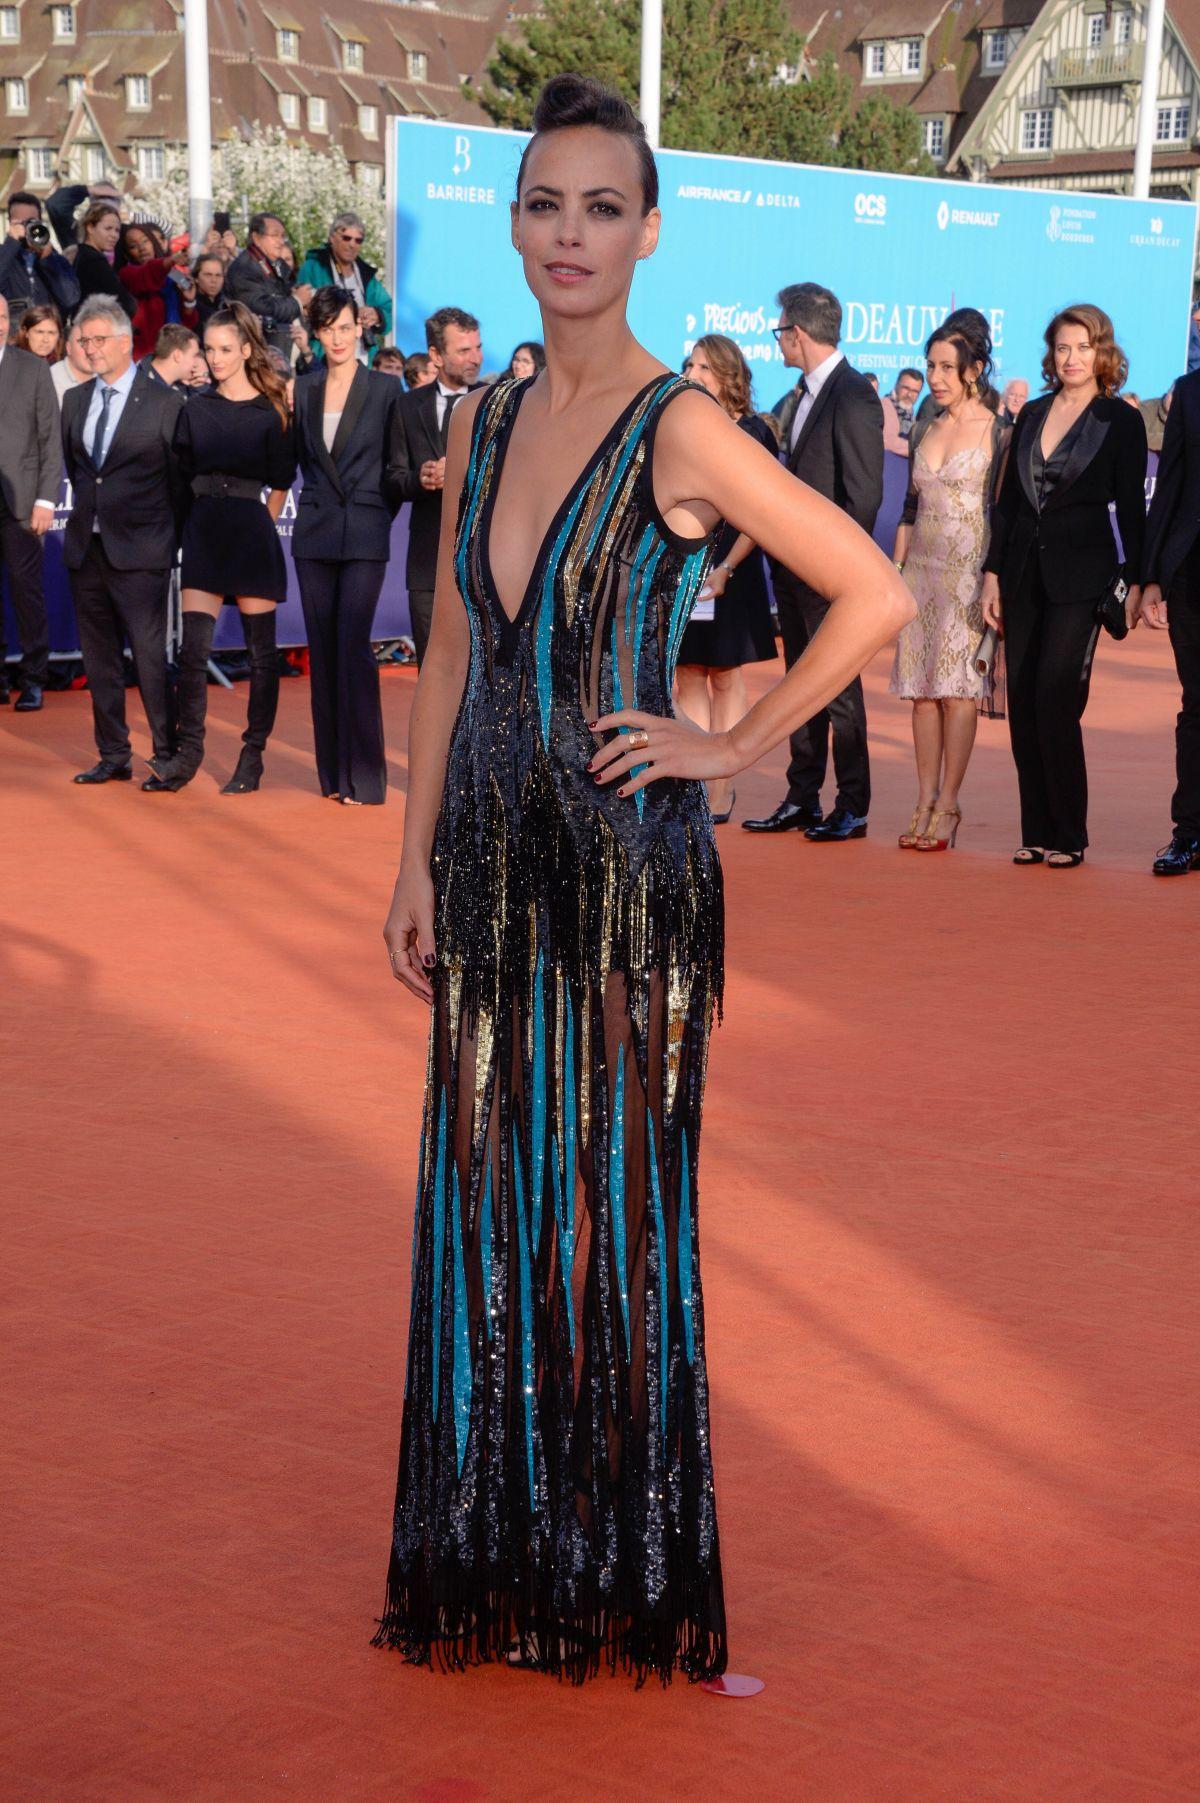 BERENICE BEJO at 43rd Deauville American Film Festival Closing Ceremony 09/09/2017